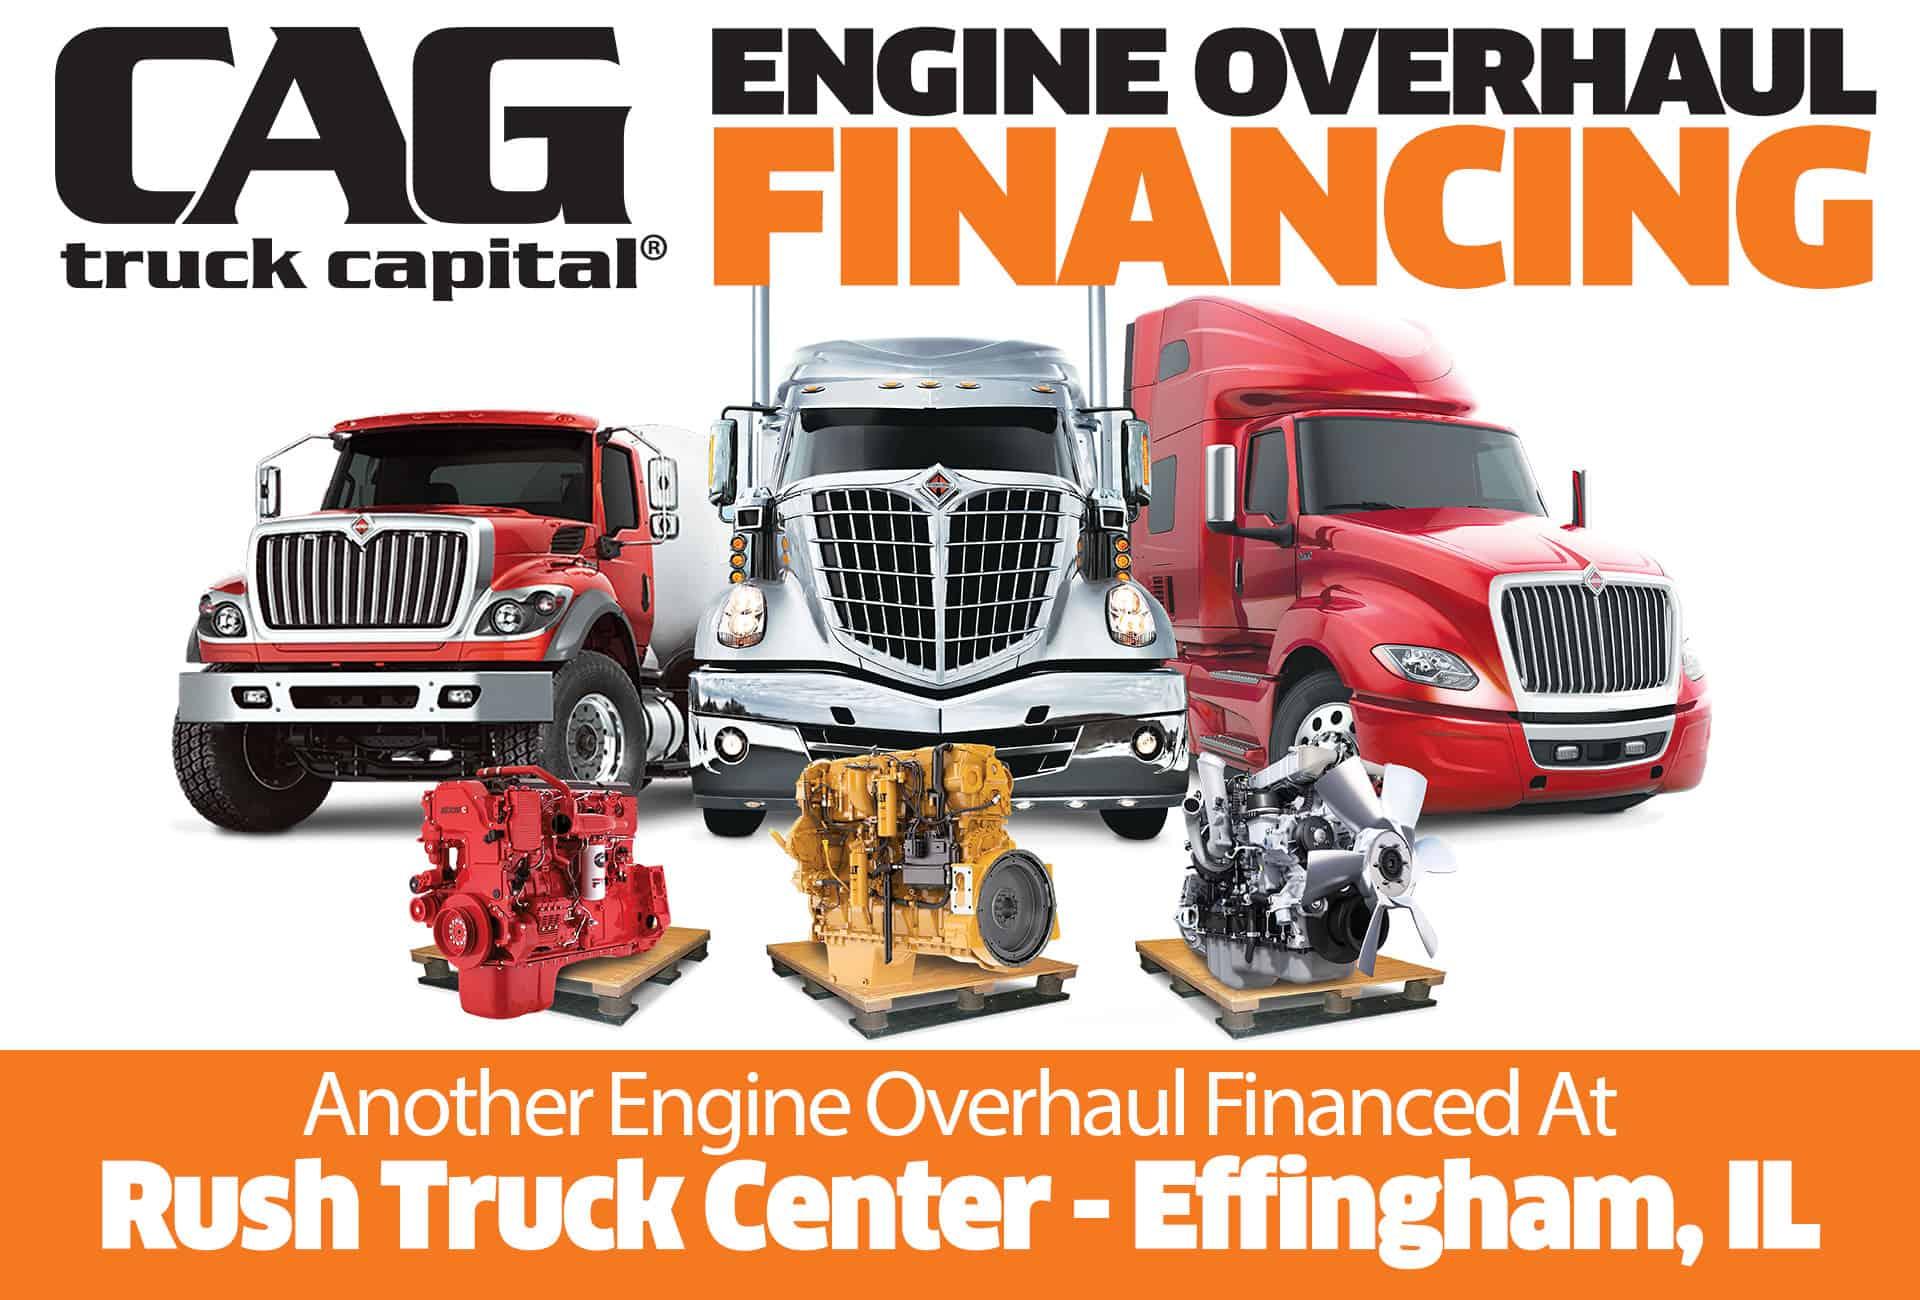 Rush Truck Center Effingham IL